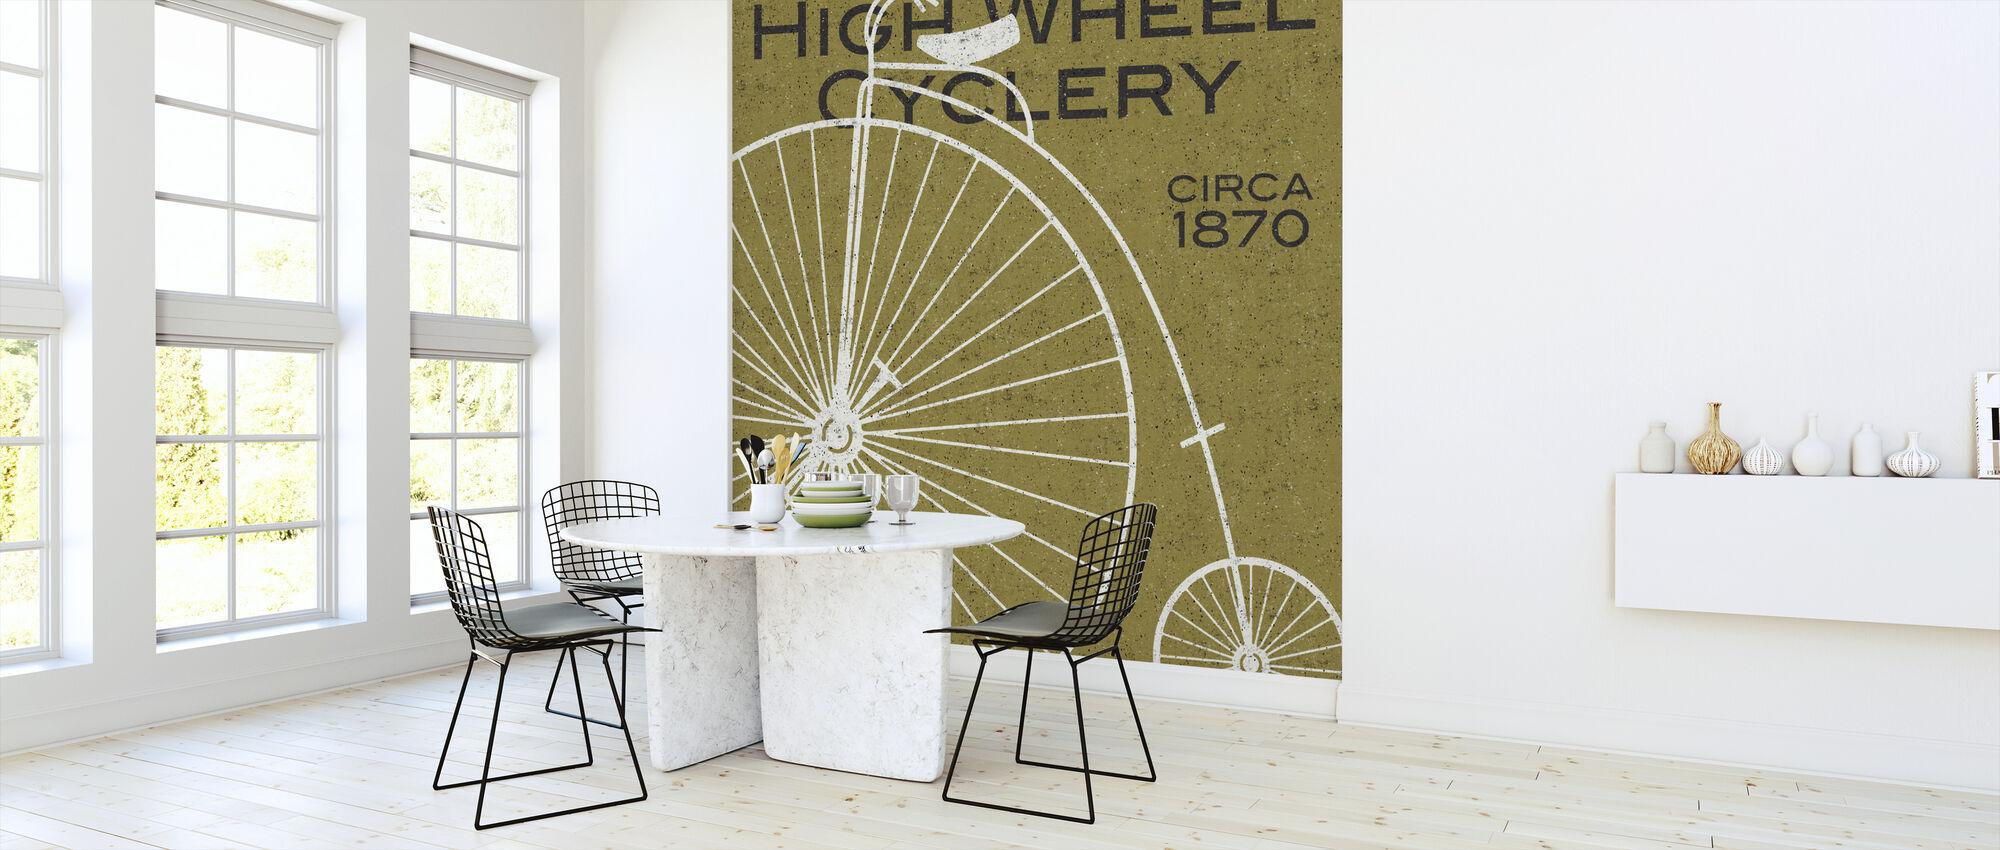 High Wheel Cyclery - Wallpaper - Kitchen